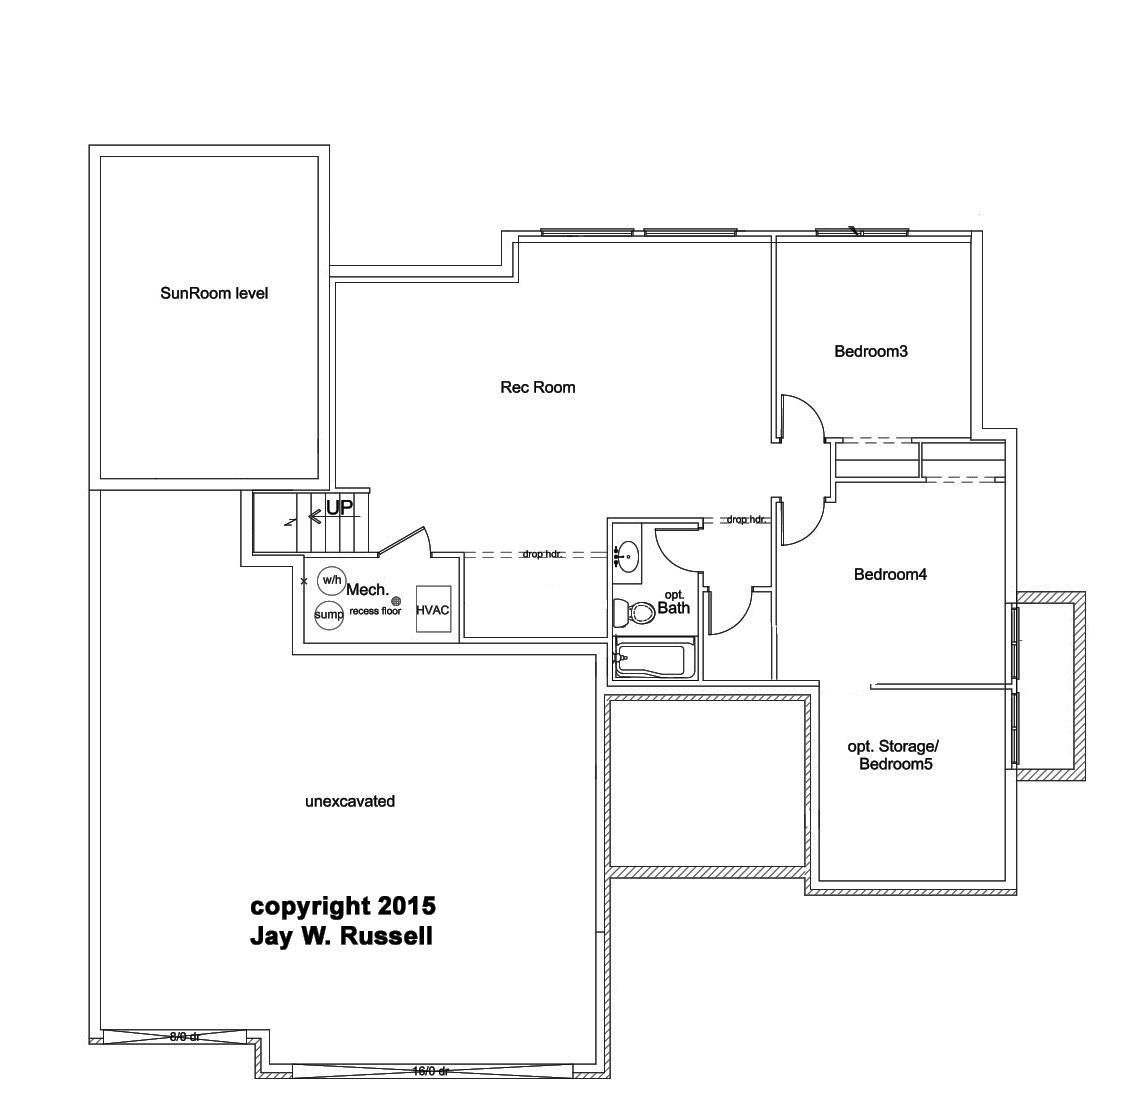 Ellington BSMT 1 by JL Russell Construction